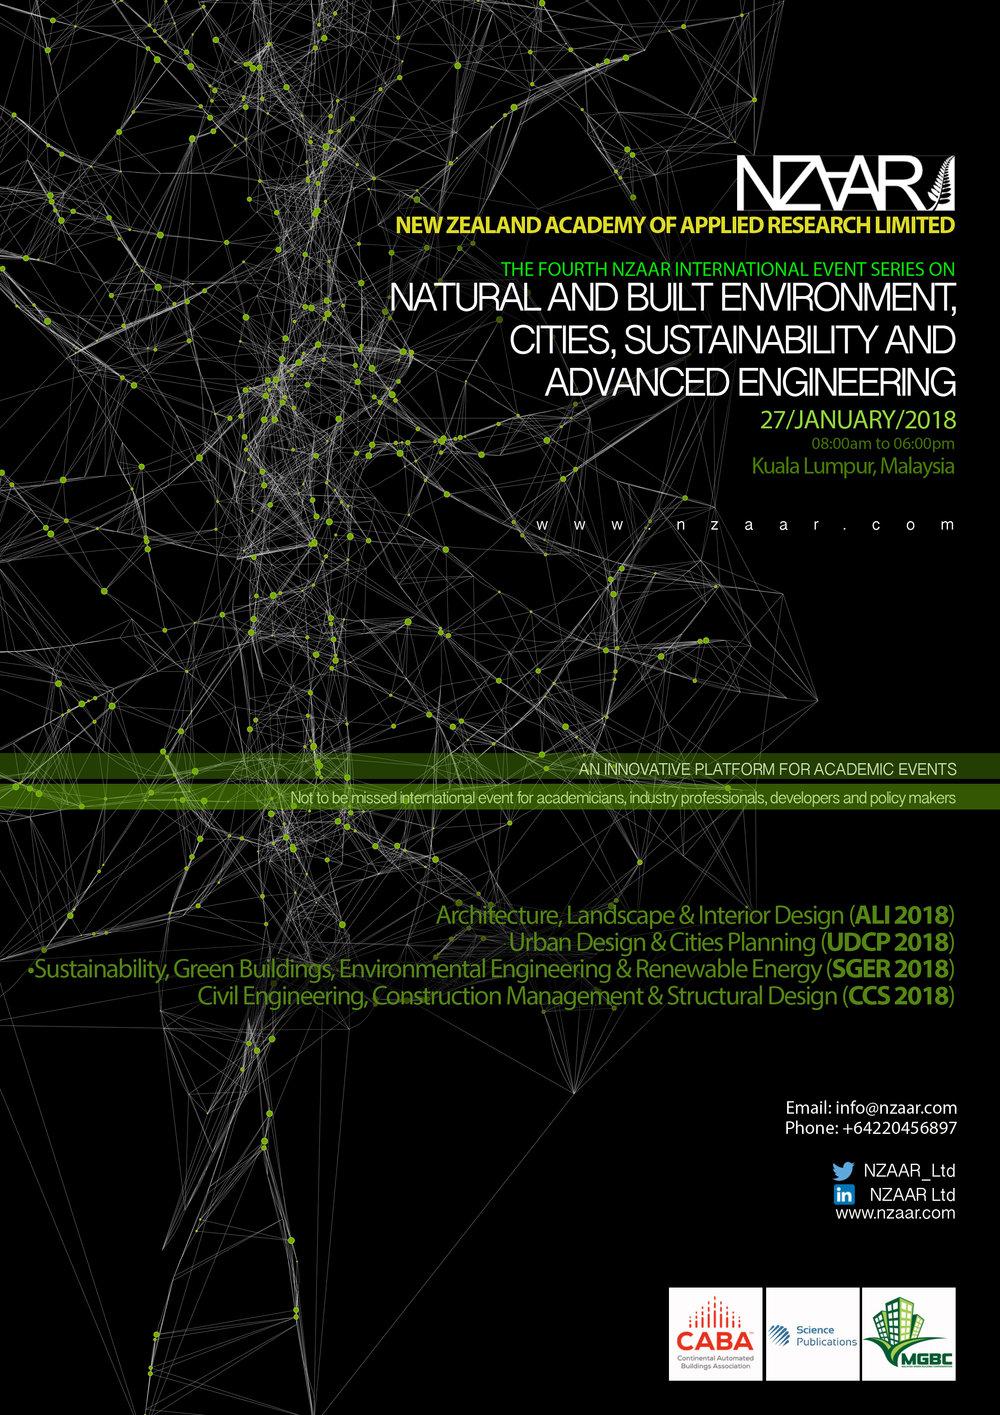 NZAAR+Poster-Green-Jan+2018.jpg